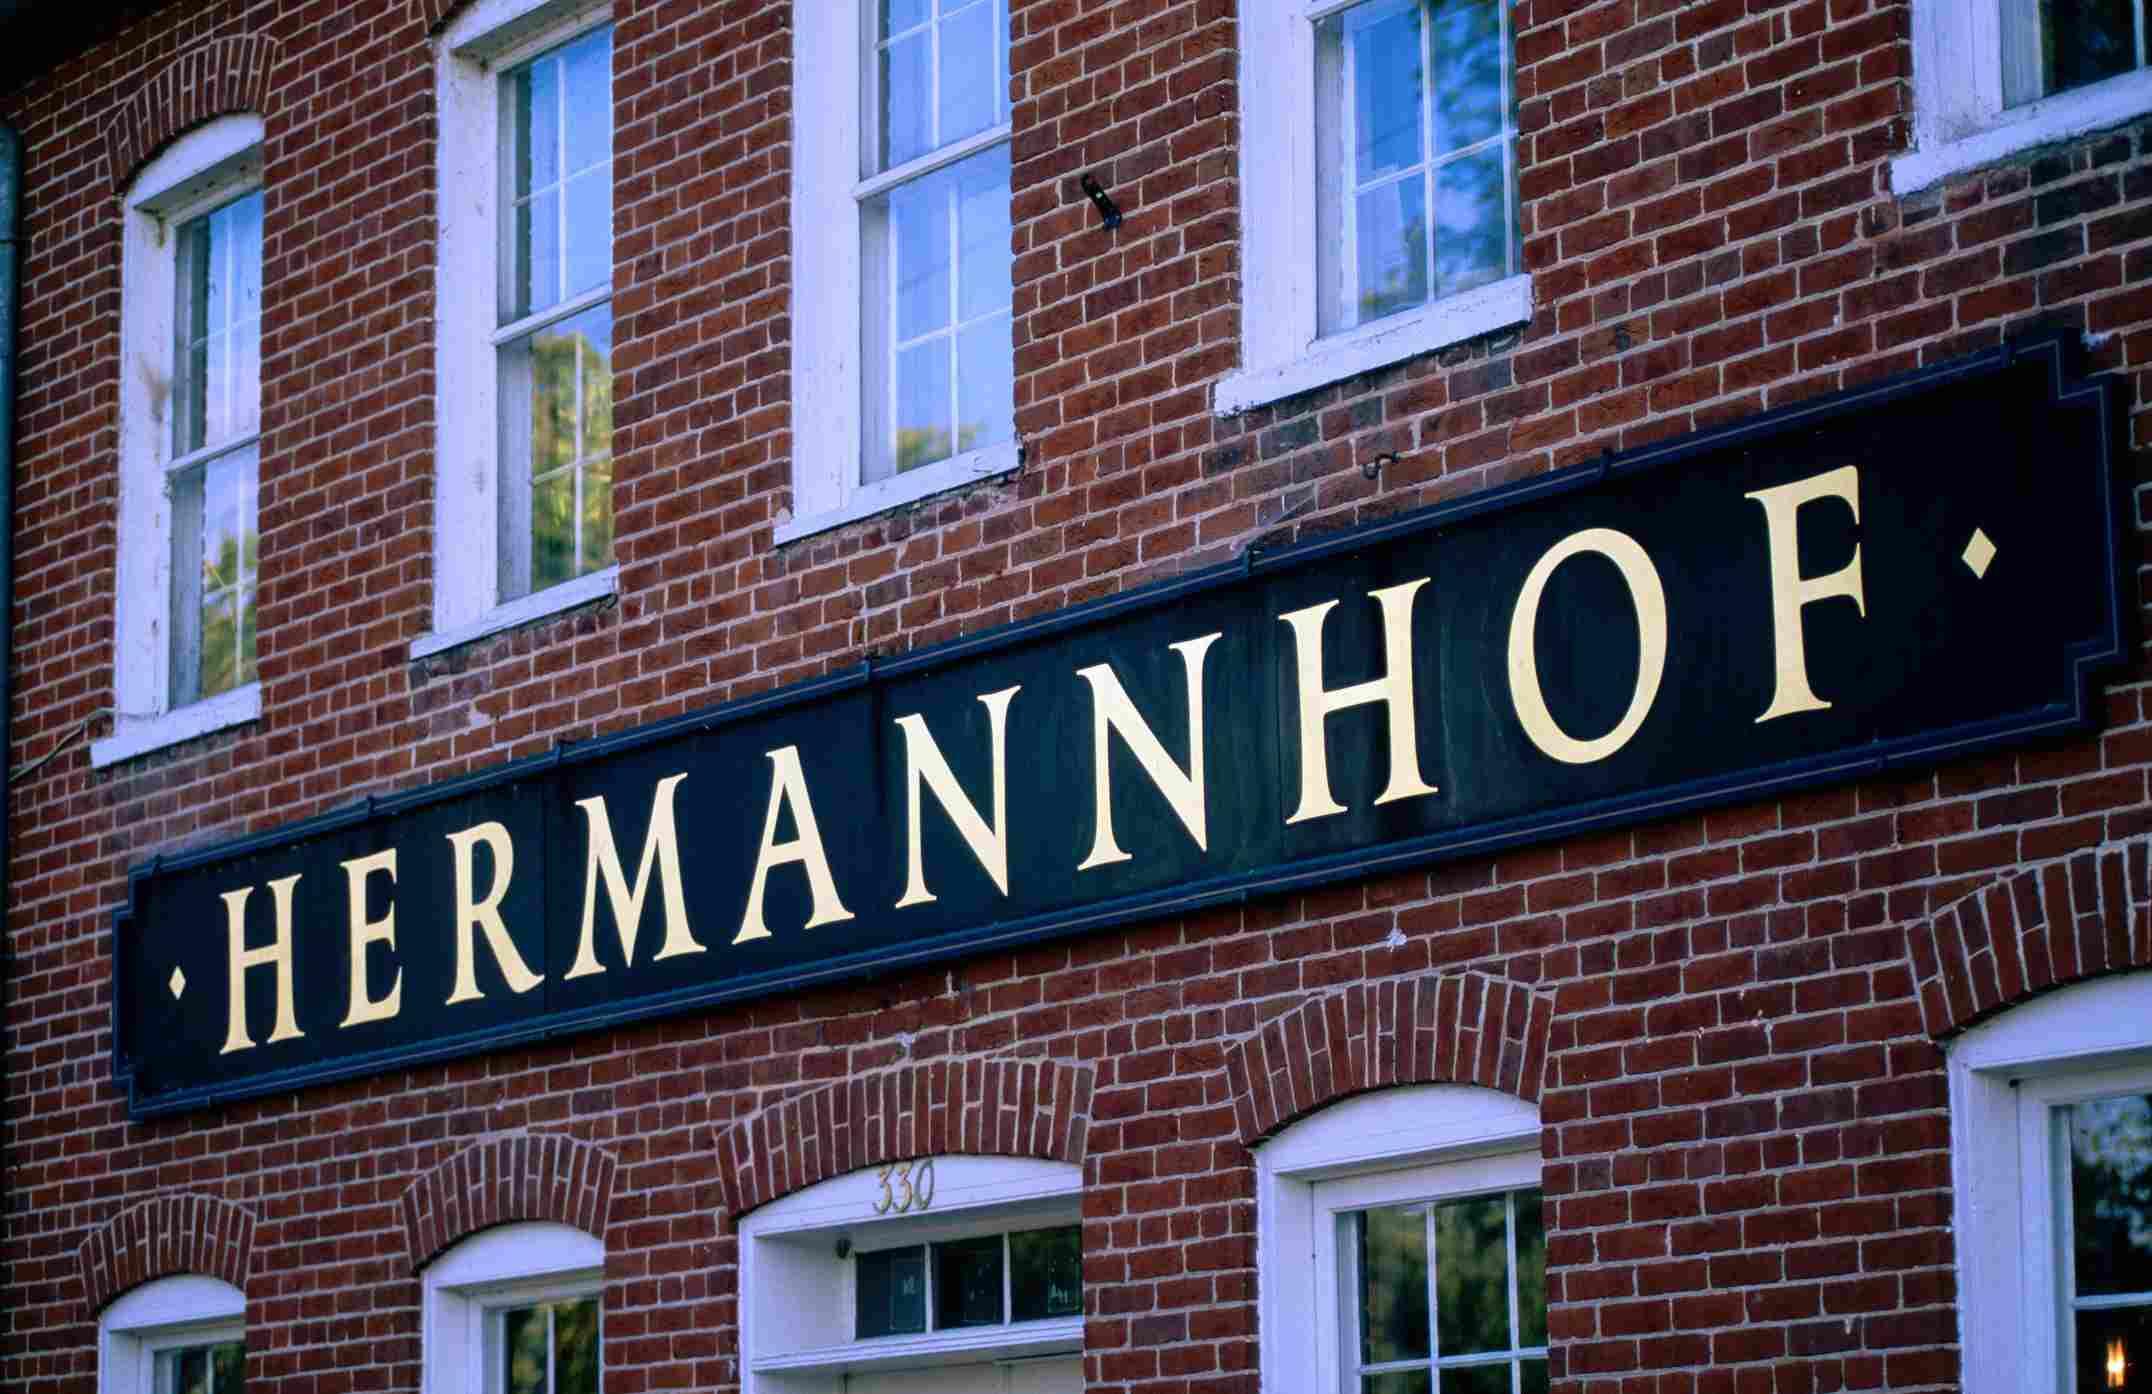 Sign at Hermannhof Winery in Herman, MO